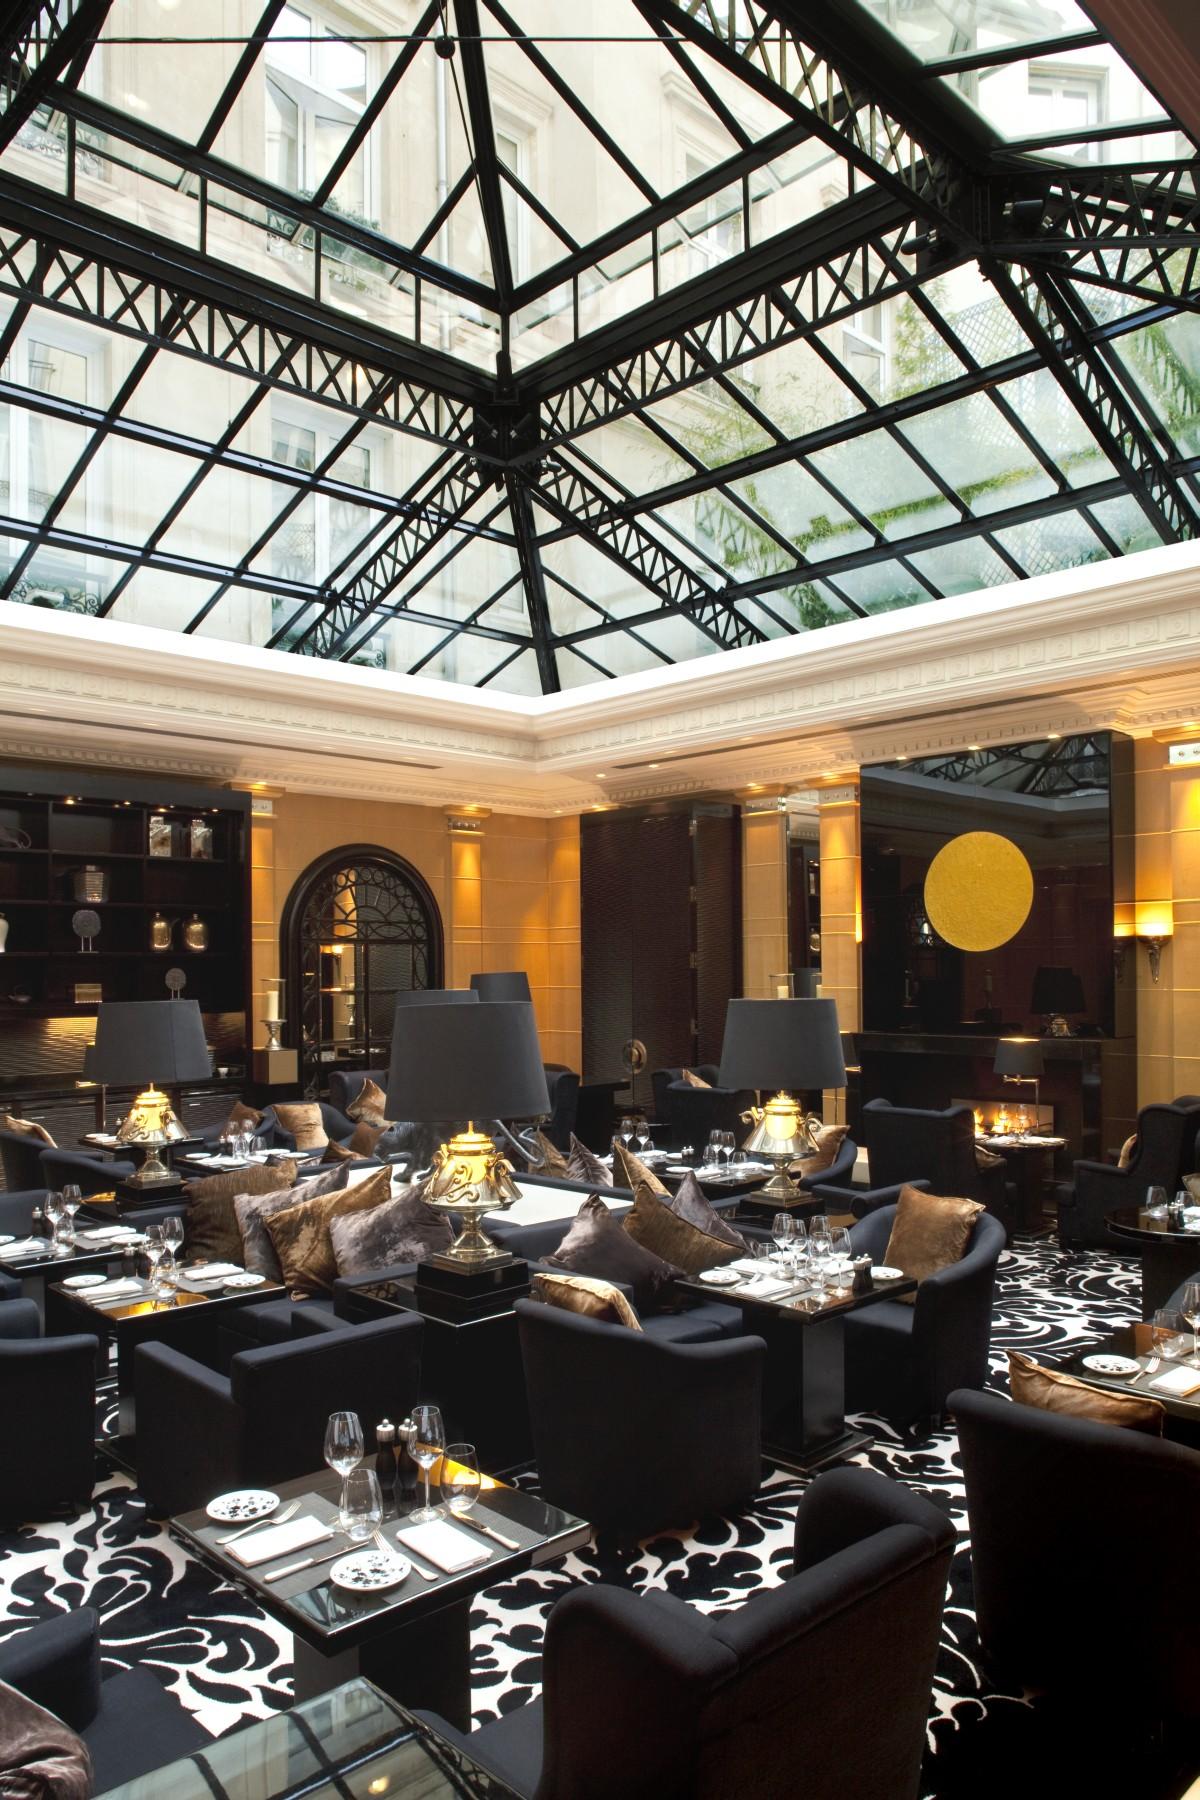 Les Restaurants De L U0026 39 H U00f4tel Hyatt Paris Madeleine